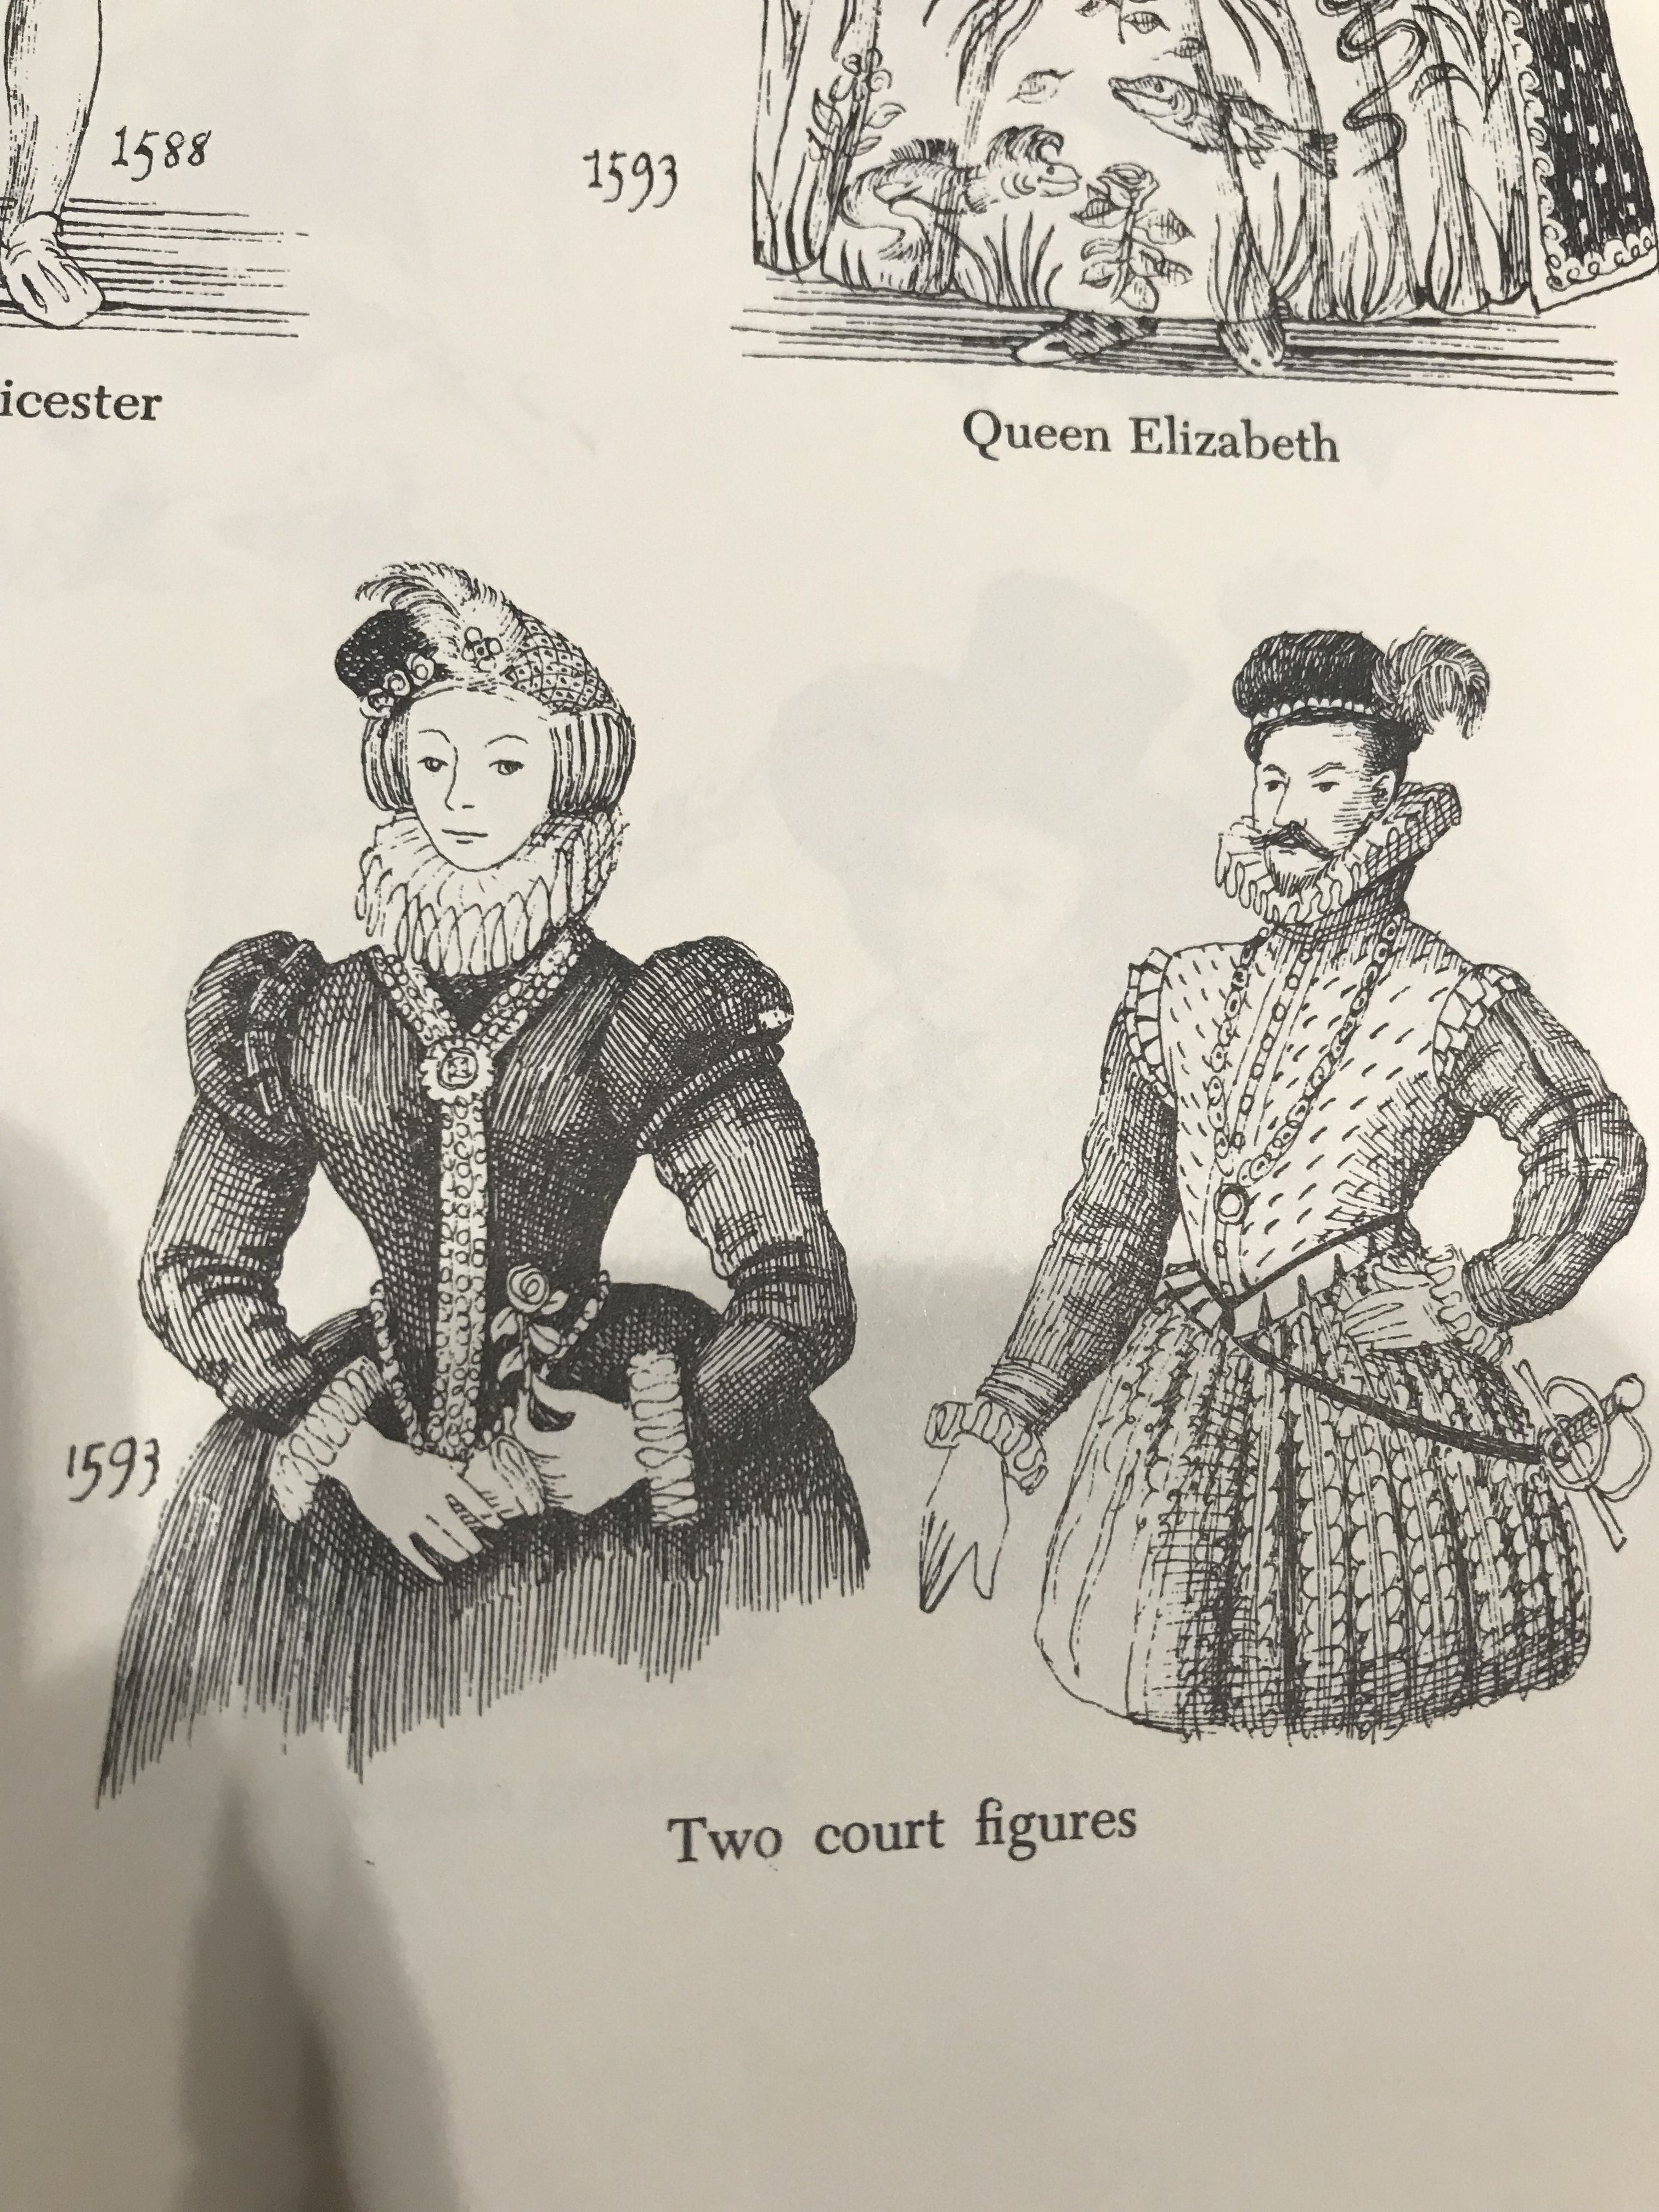 Pin by Sarah Dubos on Twelfth Night Twelfth night, Male